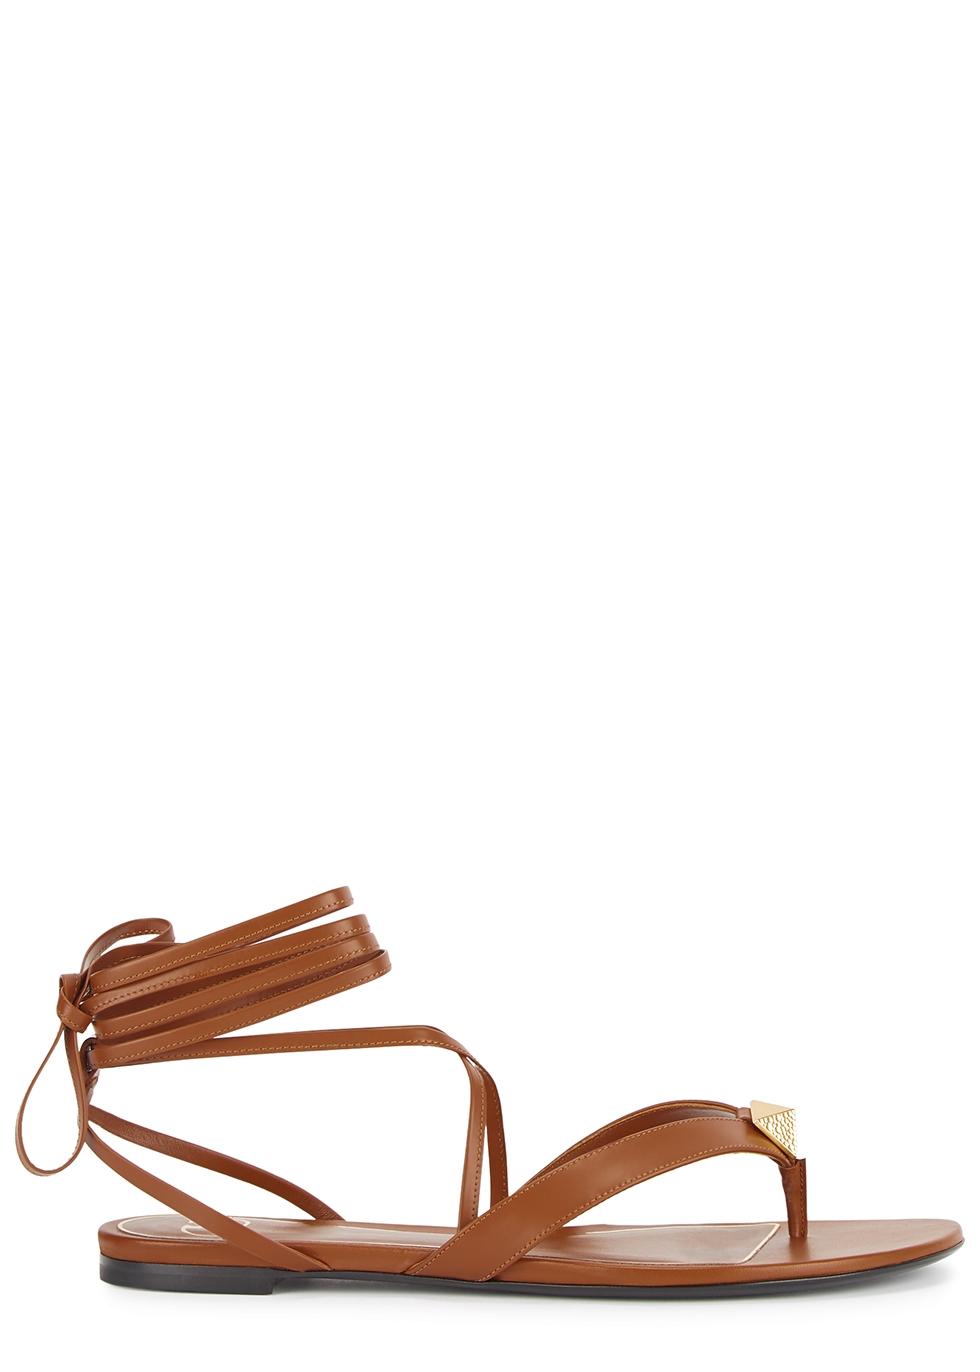 Valentino Garavani Upstud leather thong sandals